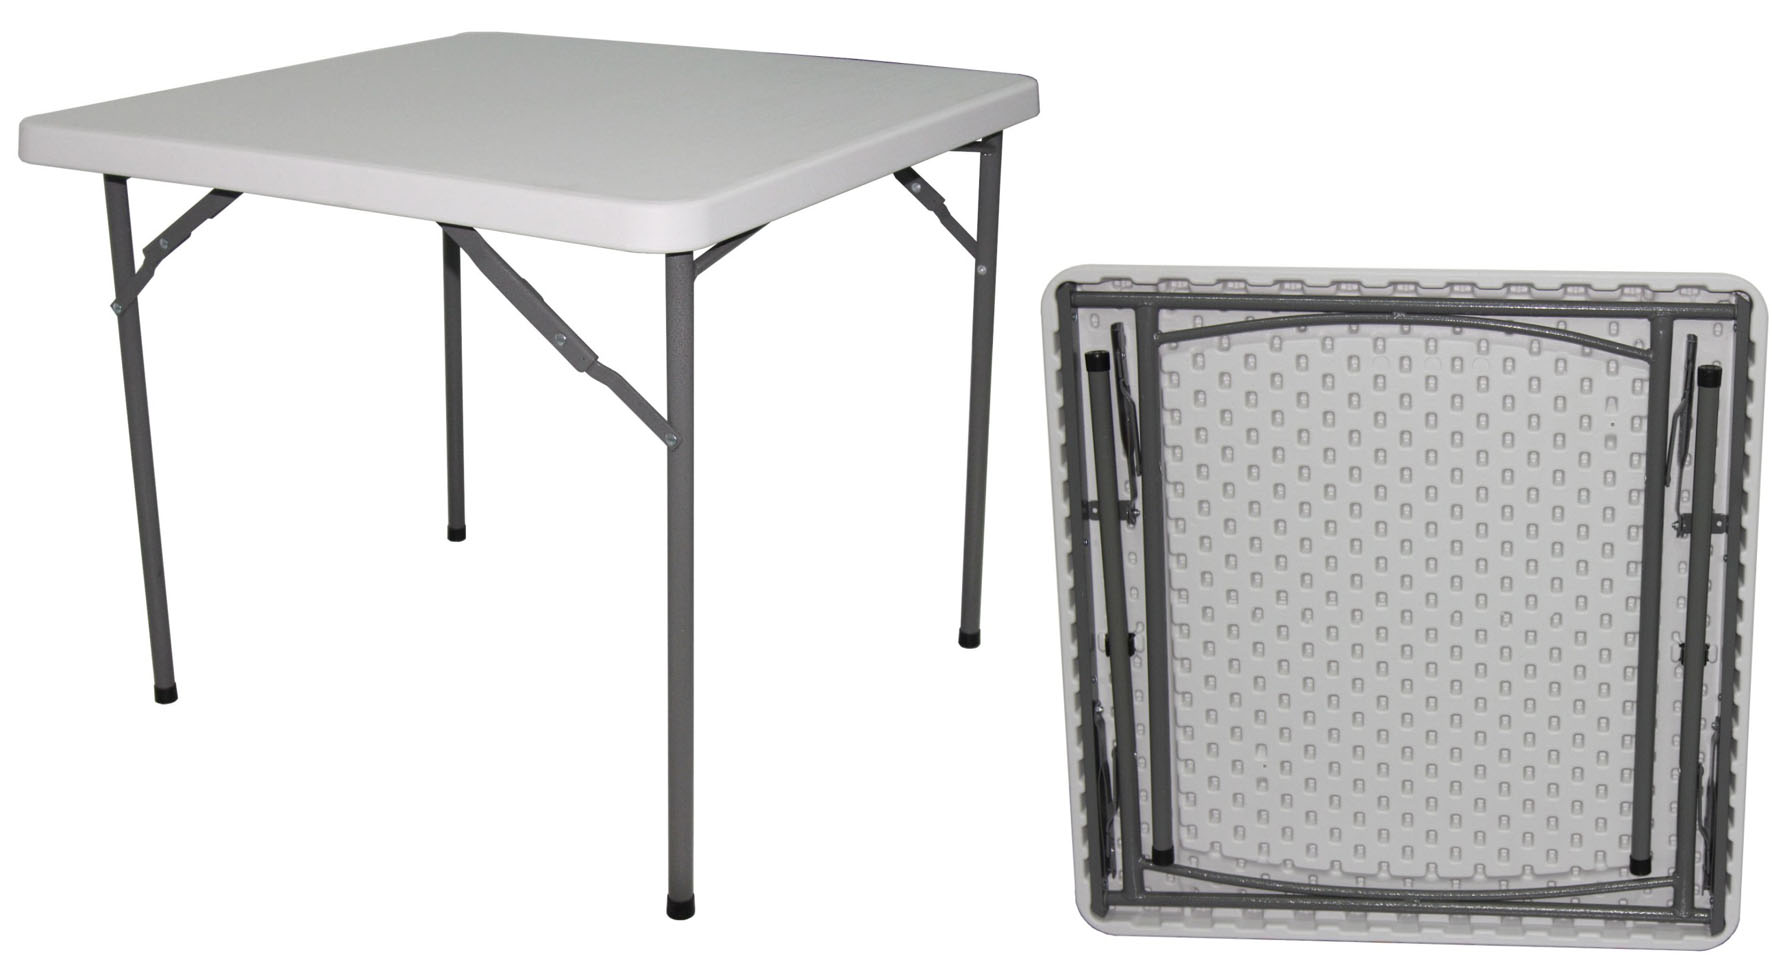 venta de mesas plegables para eventos catering